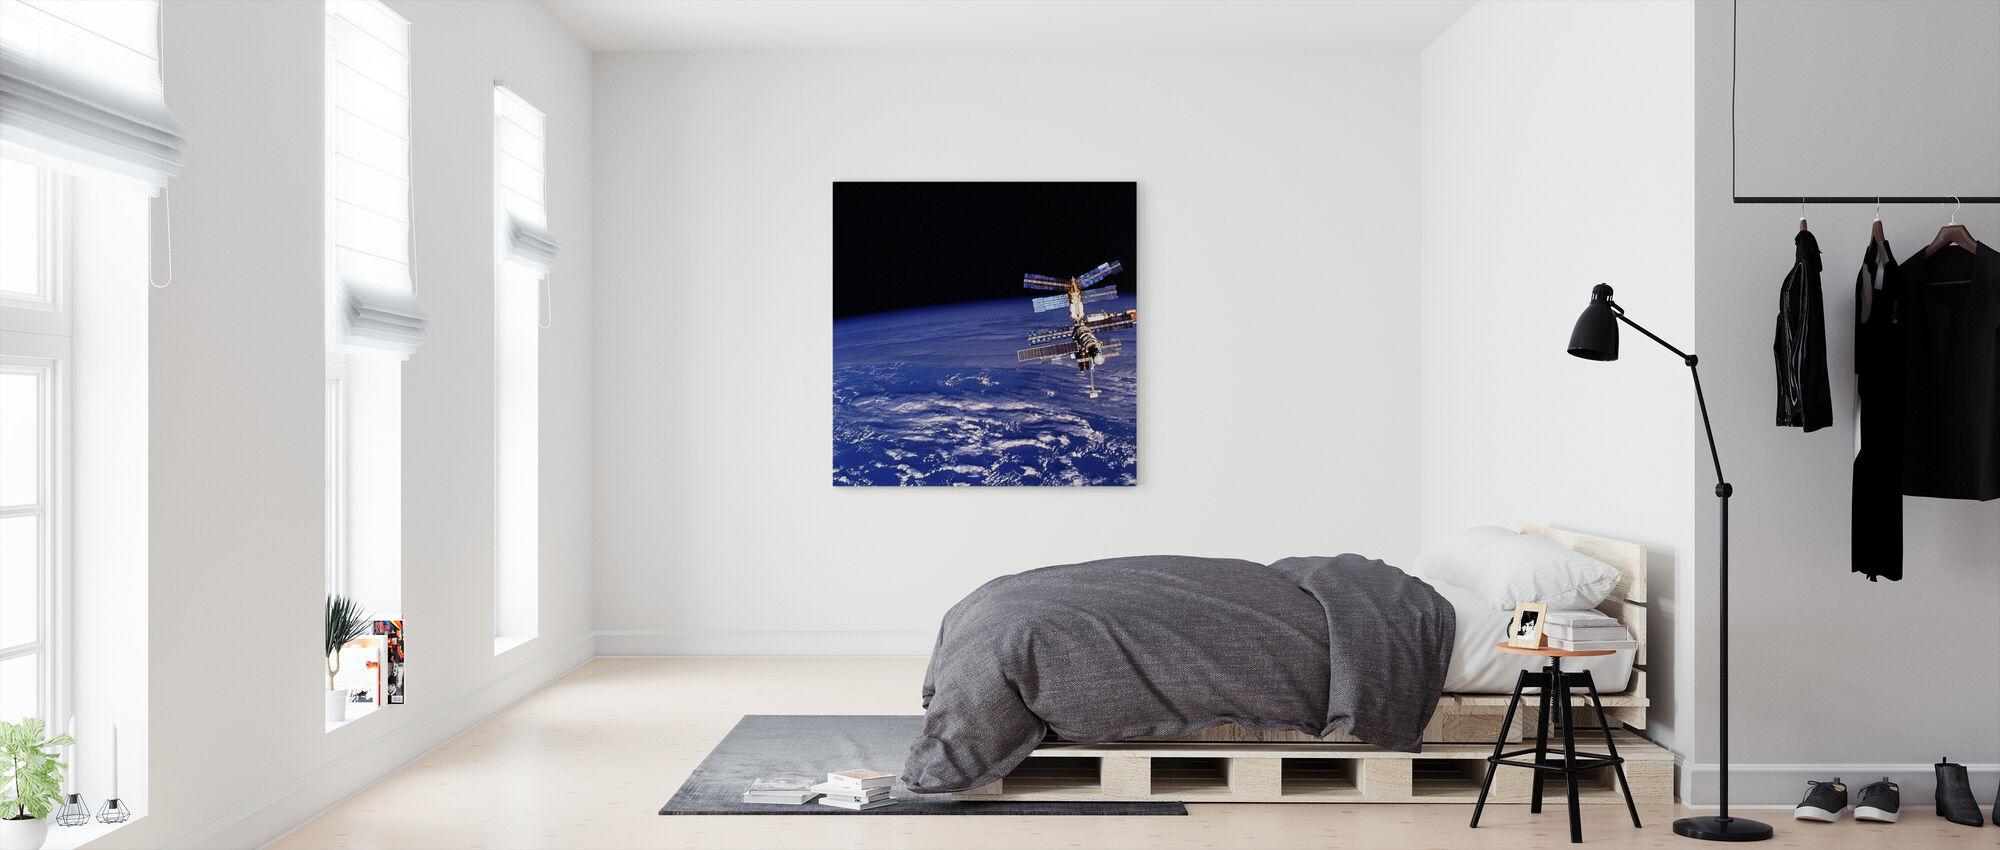 Mir Space Station - Canvas print - Bedroom